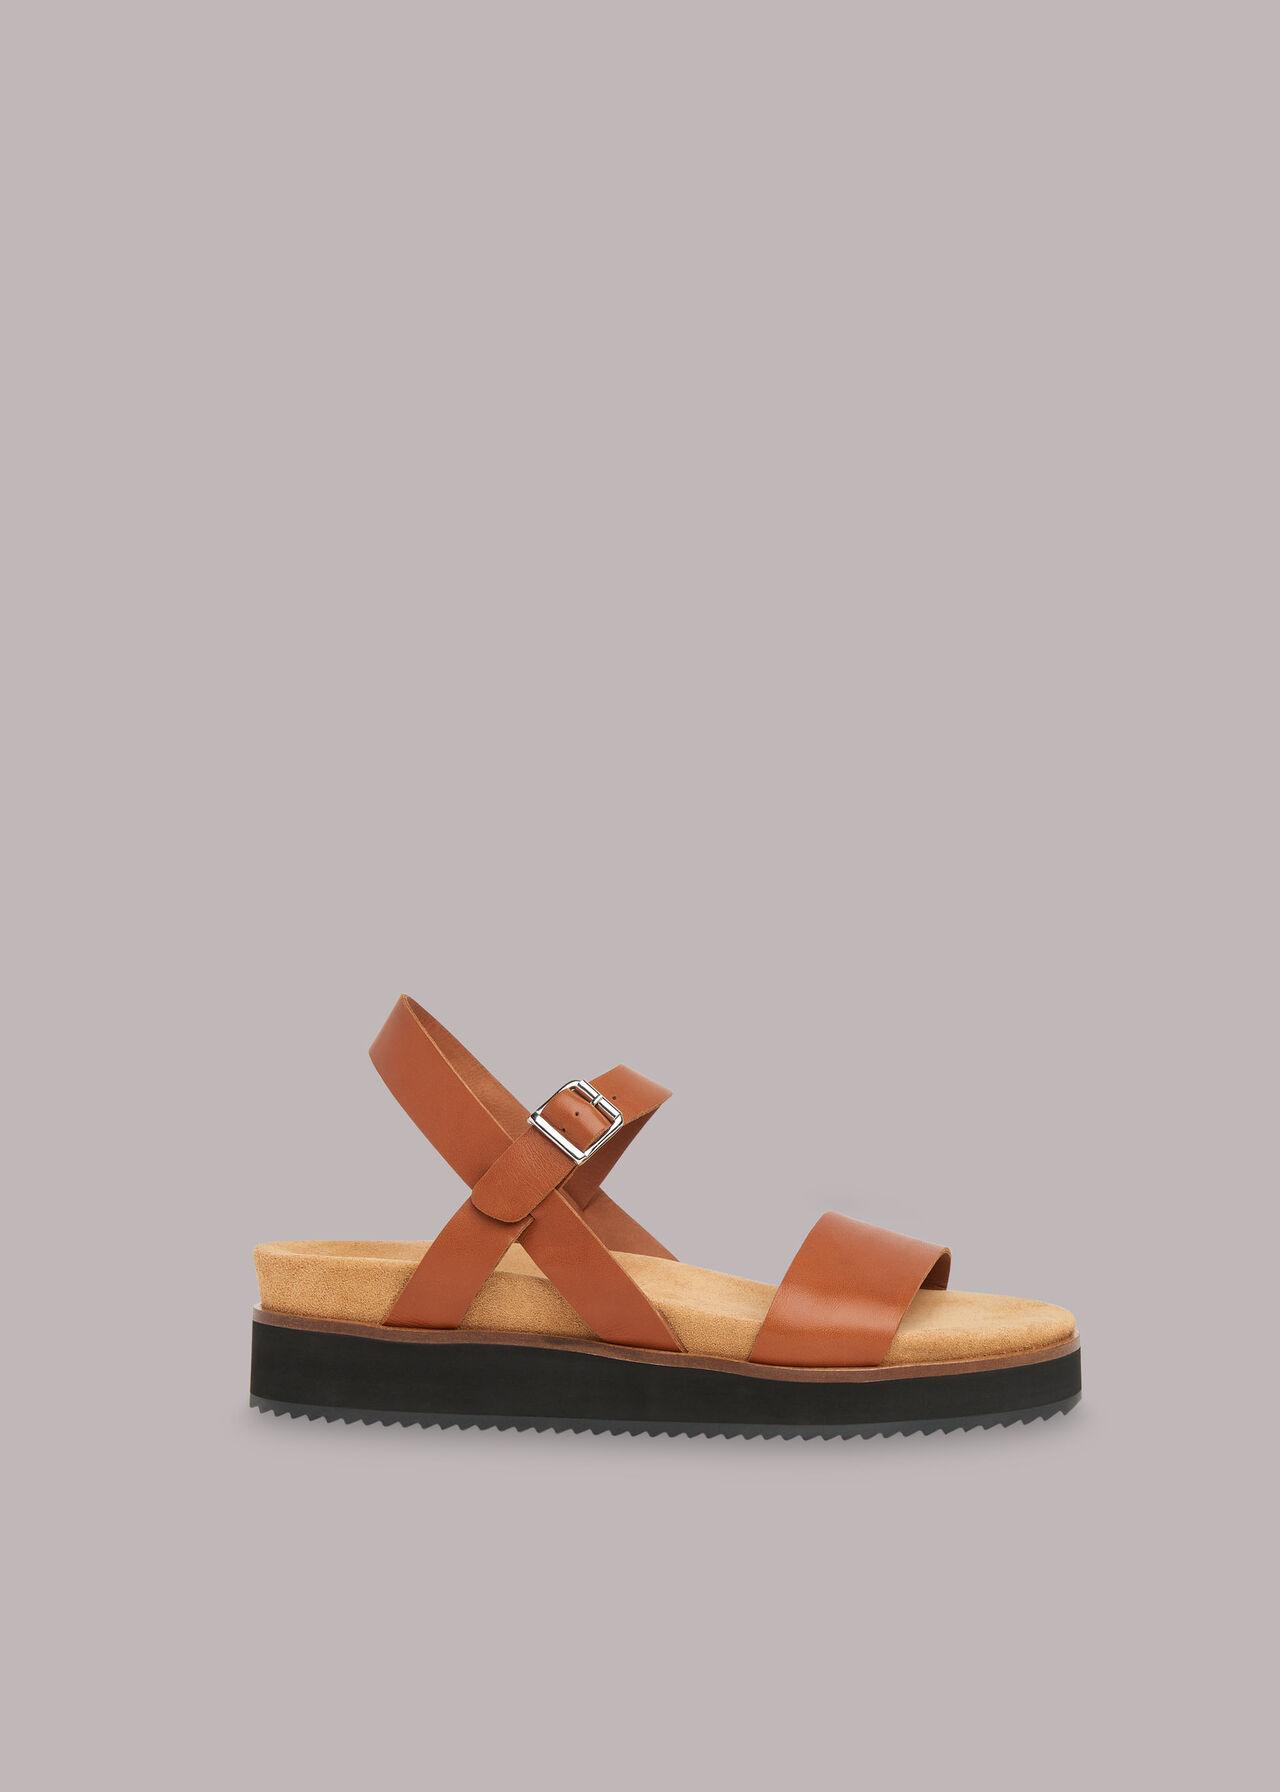 Nola Footbed Sandal